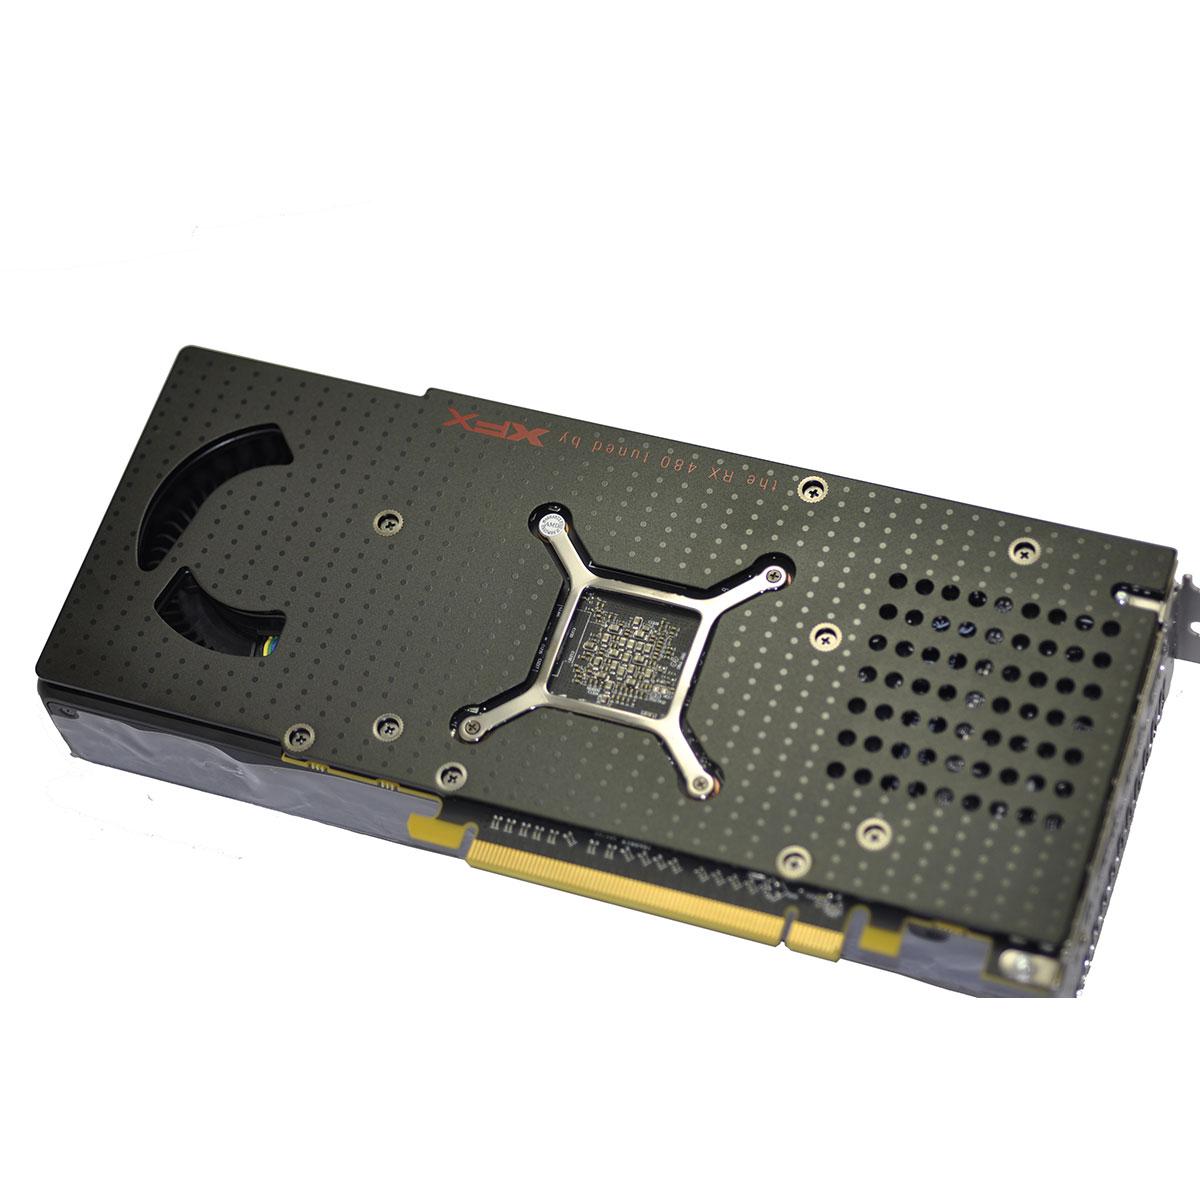 XFX  - 8Go - carte Graphique pour Gamer - GPU ATI/AMD - 2